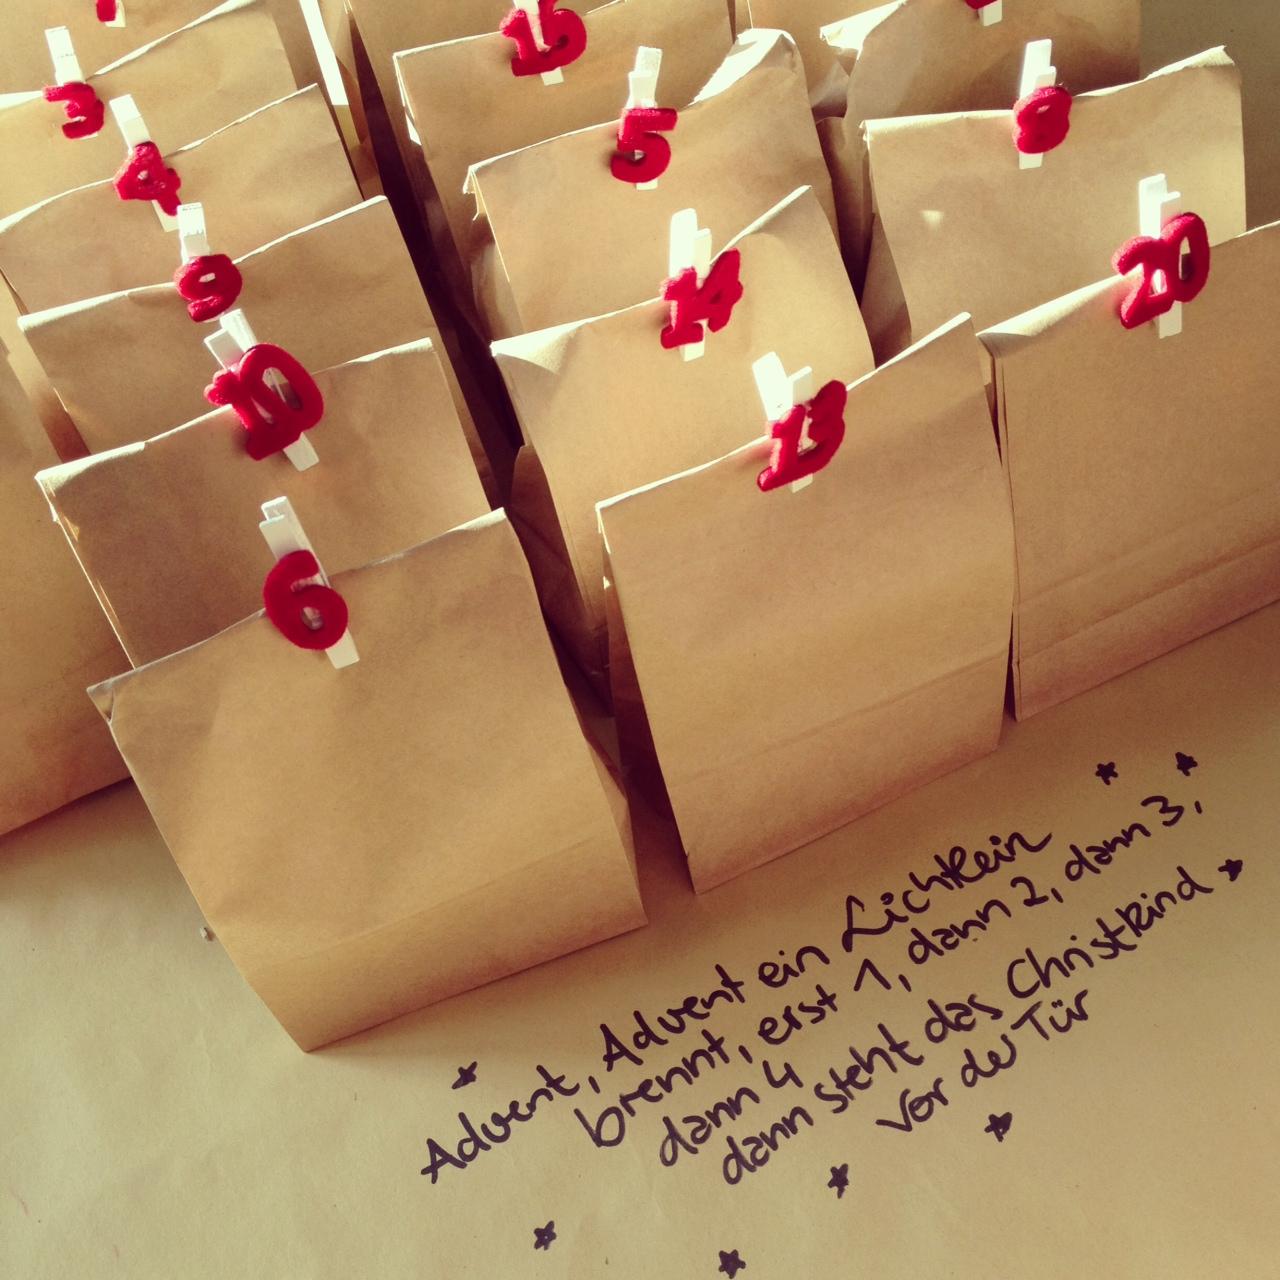 Geschenk Beste Freundin Selbstgemacht Rl92 Startupjobsfa